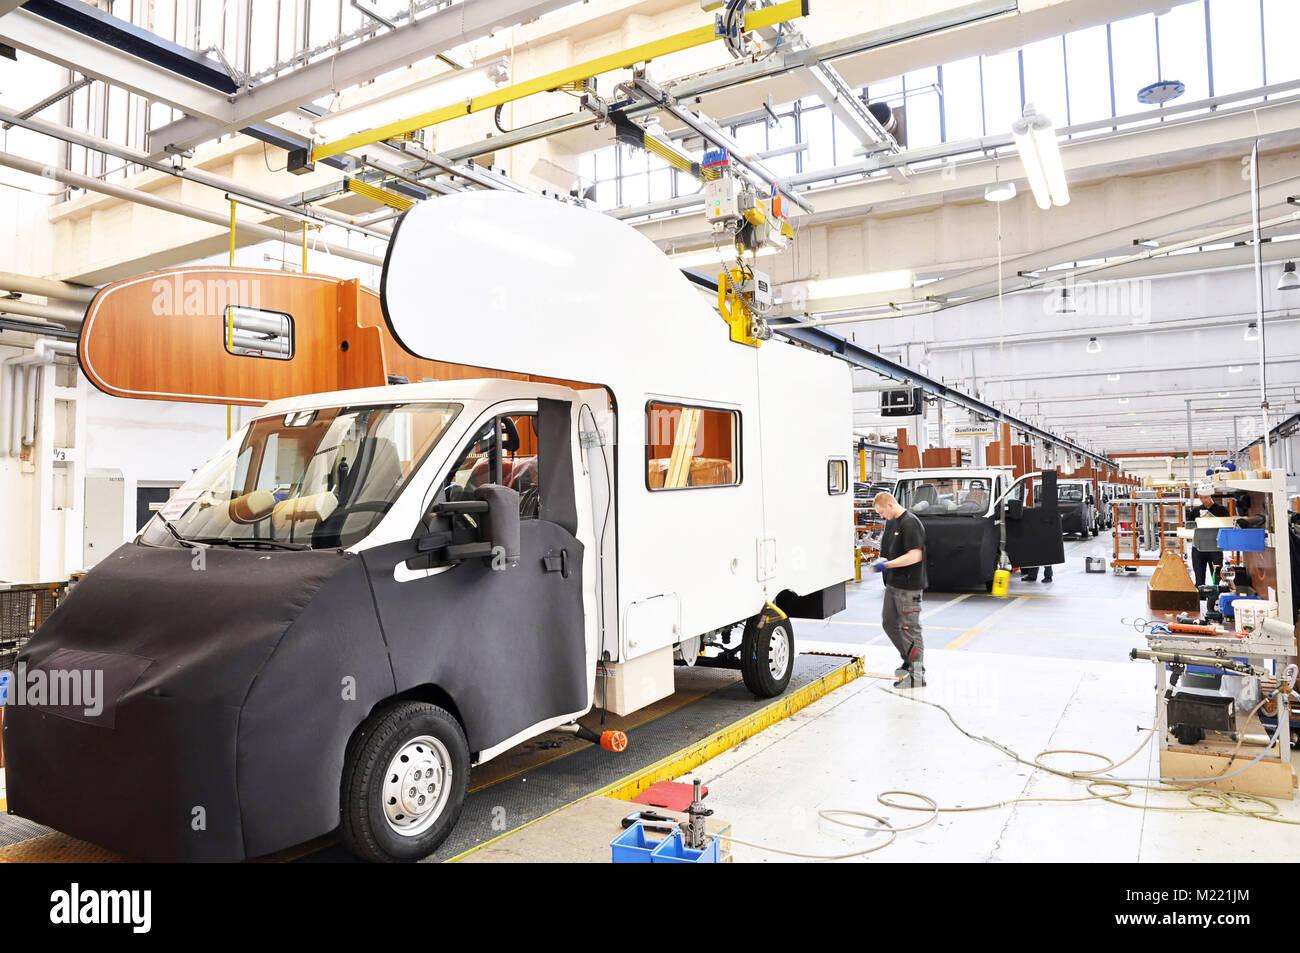 production of camper vans/ motorhomes/ caravans in a factory - Stock Image